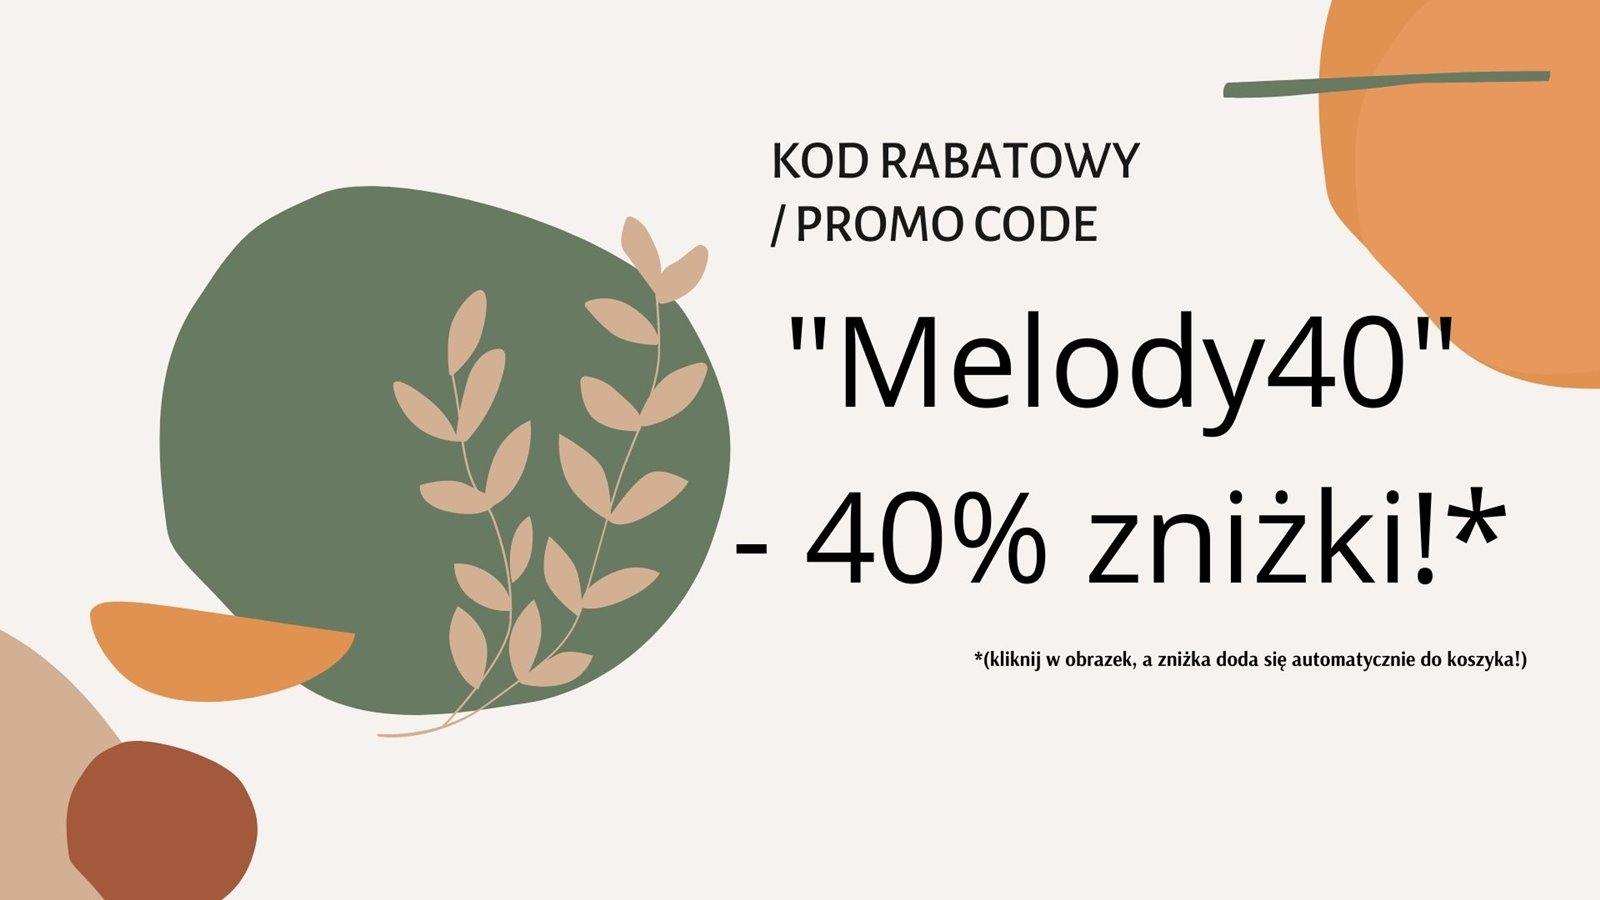 7 kod rabatowy, promo code, promocode melody40 rosental organics 40% znizki na zakupy